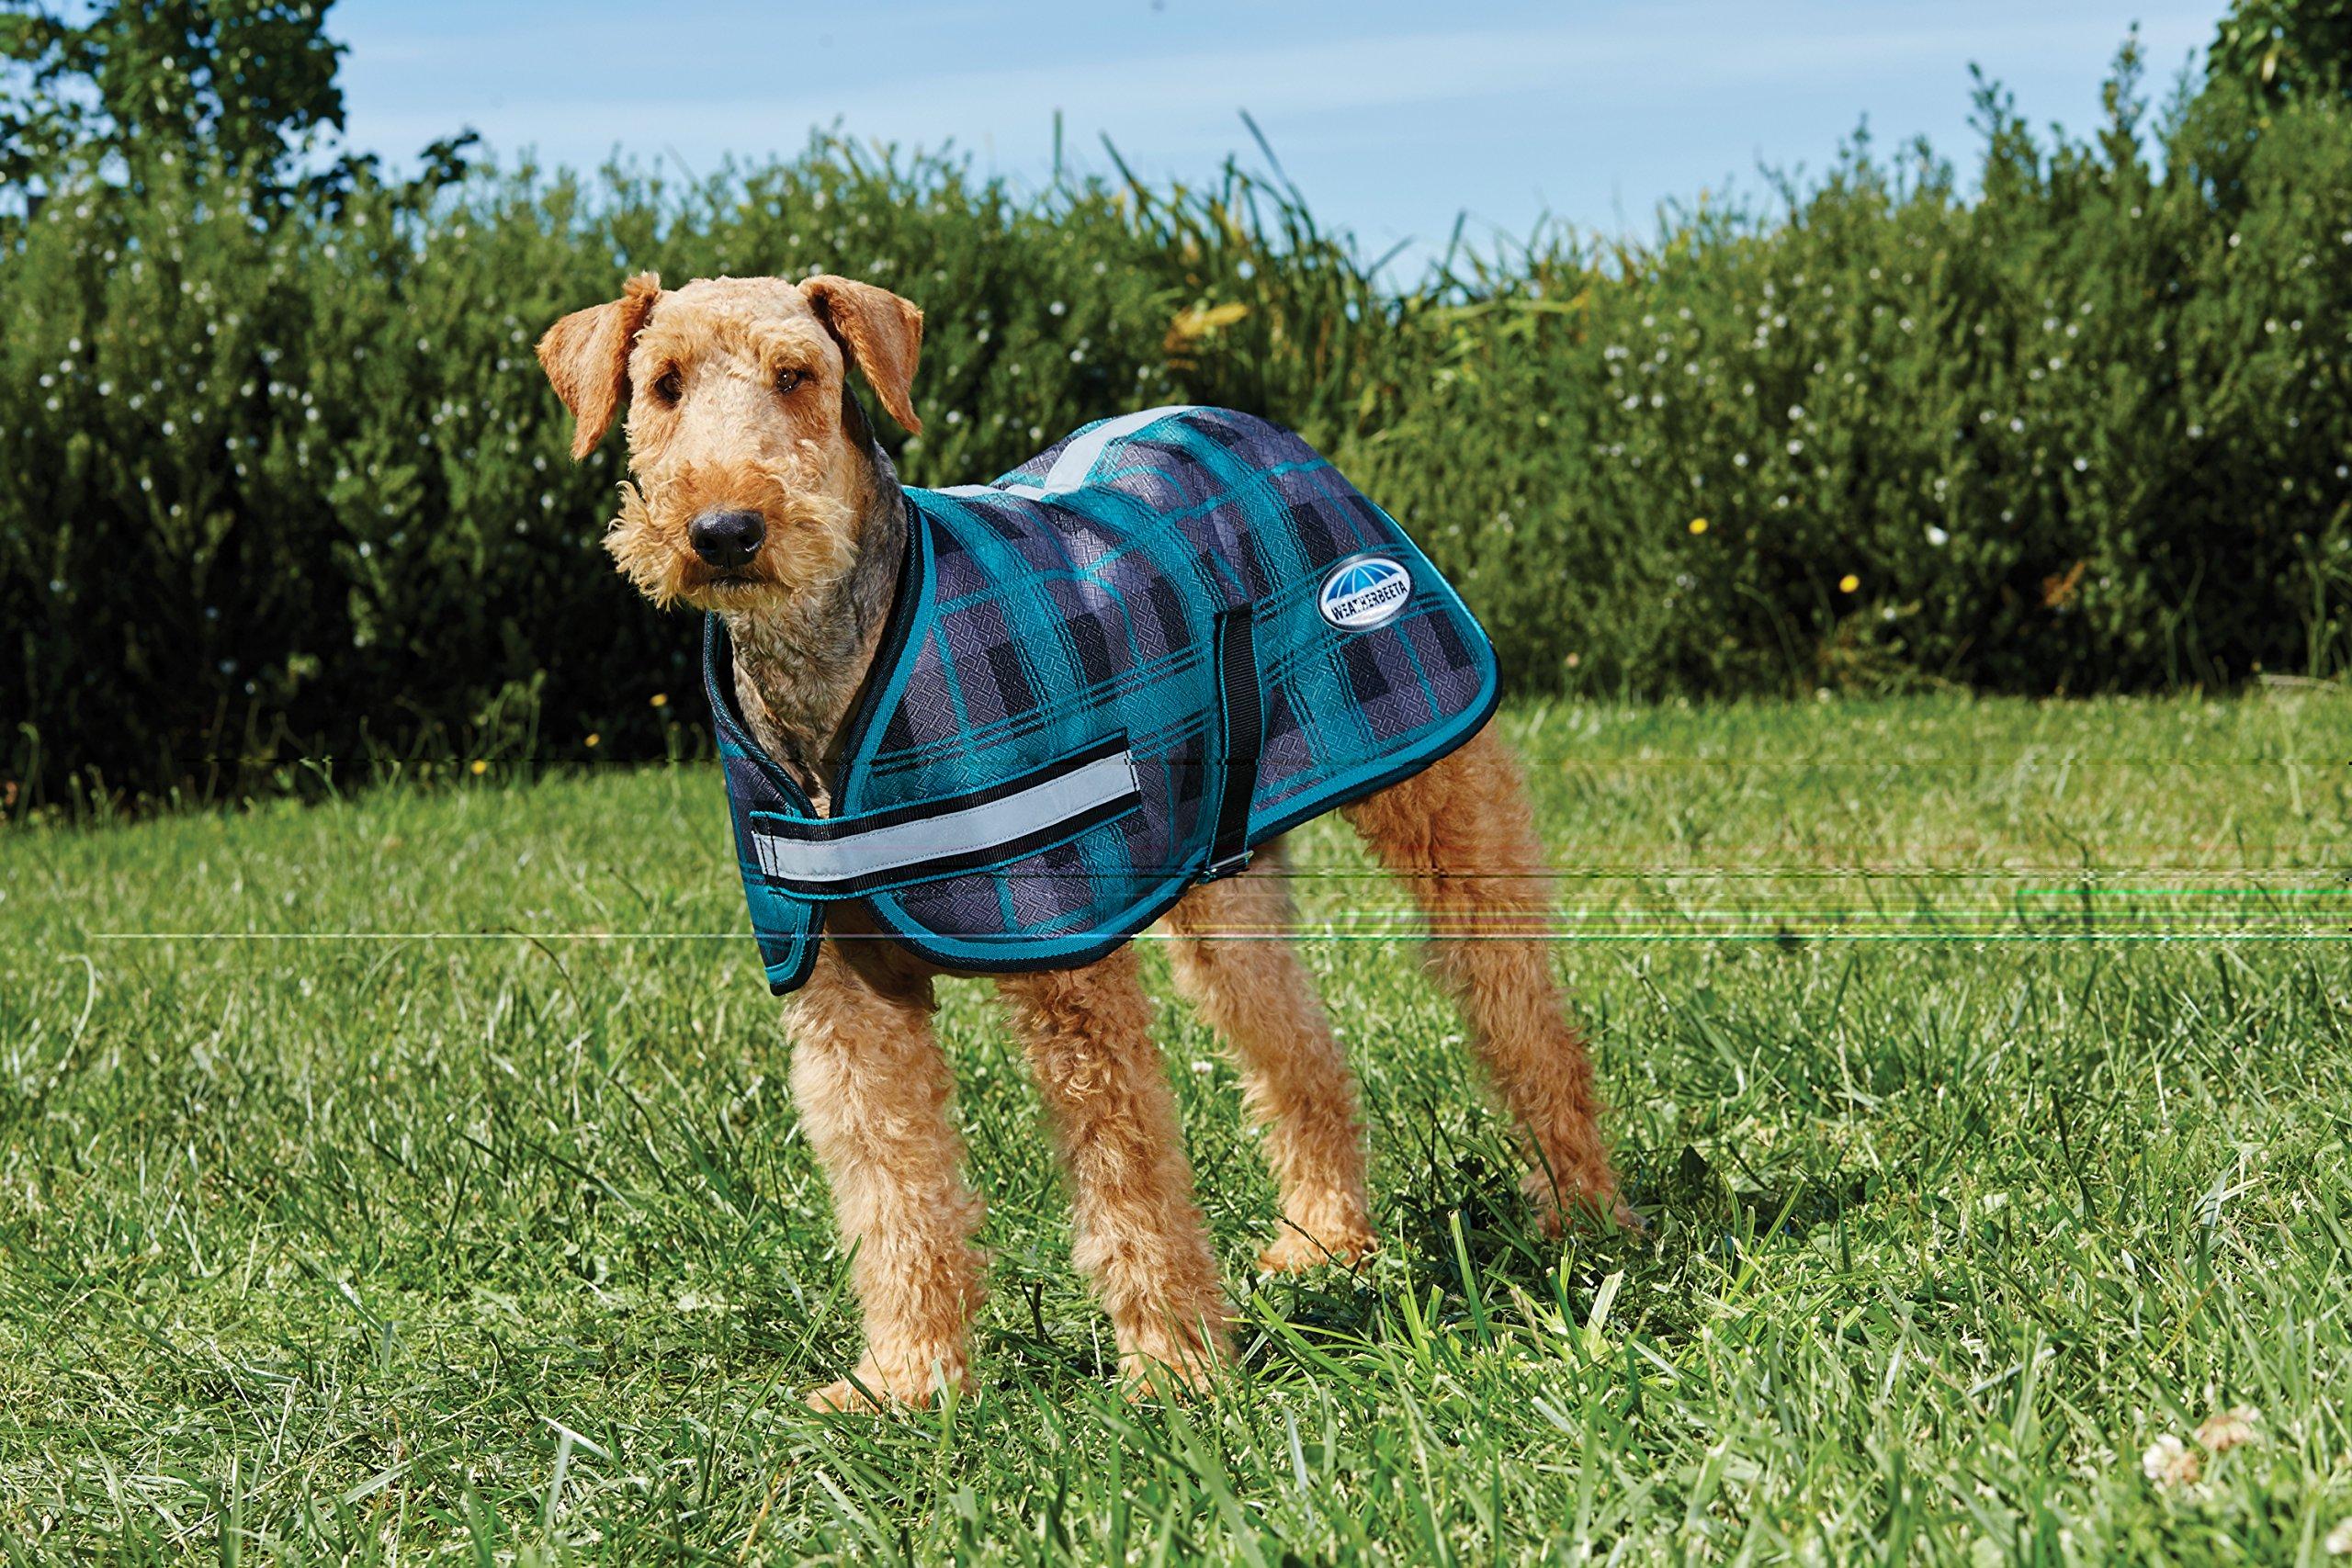 Weatherbeeta Parka 1200D Dog Coat (14'', Black/Teal Plaid)